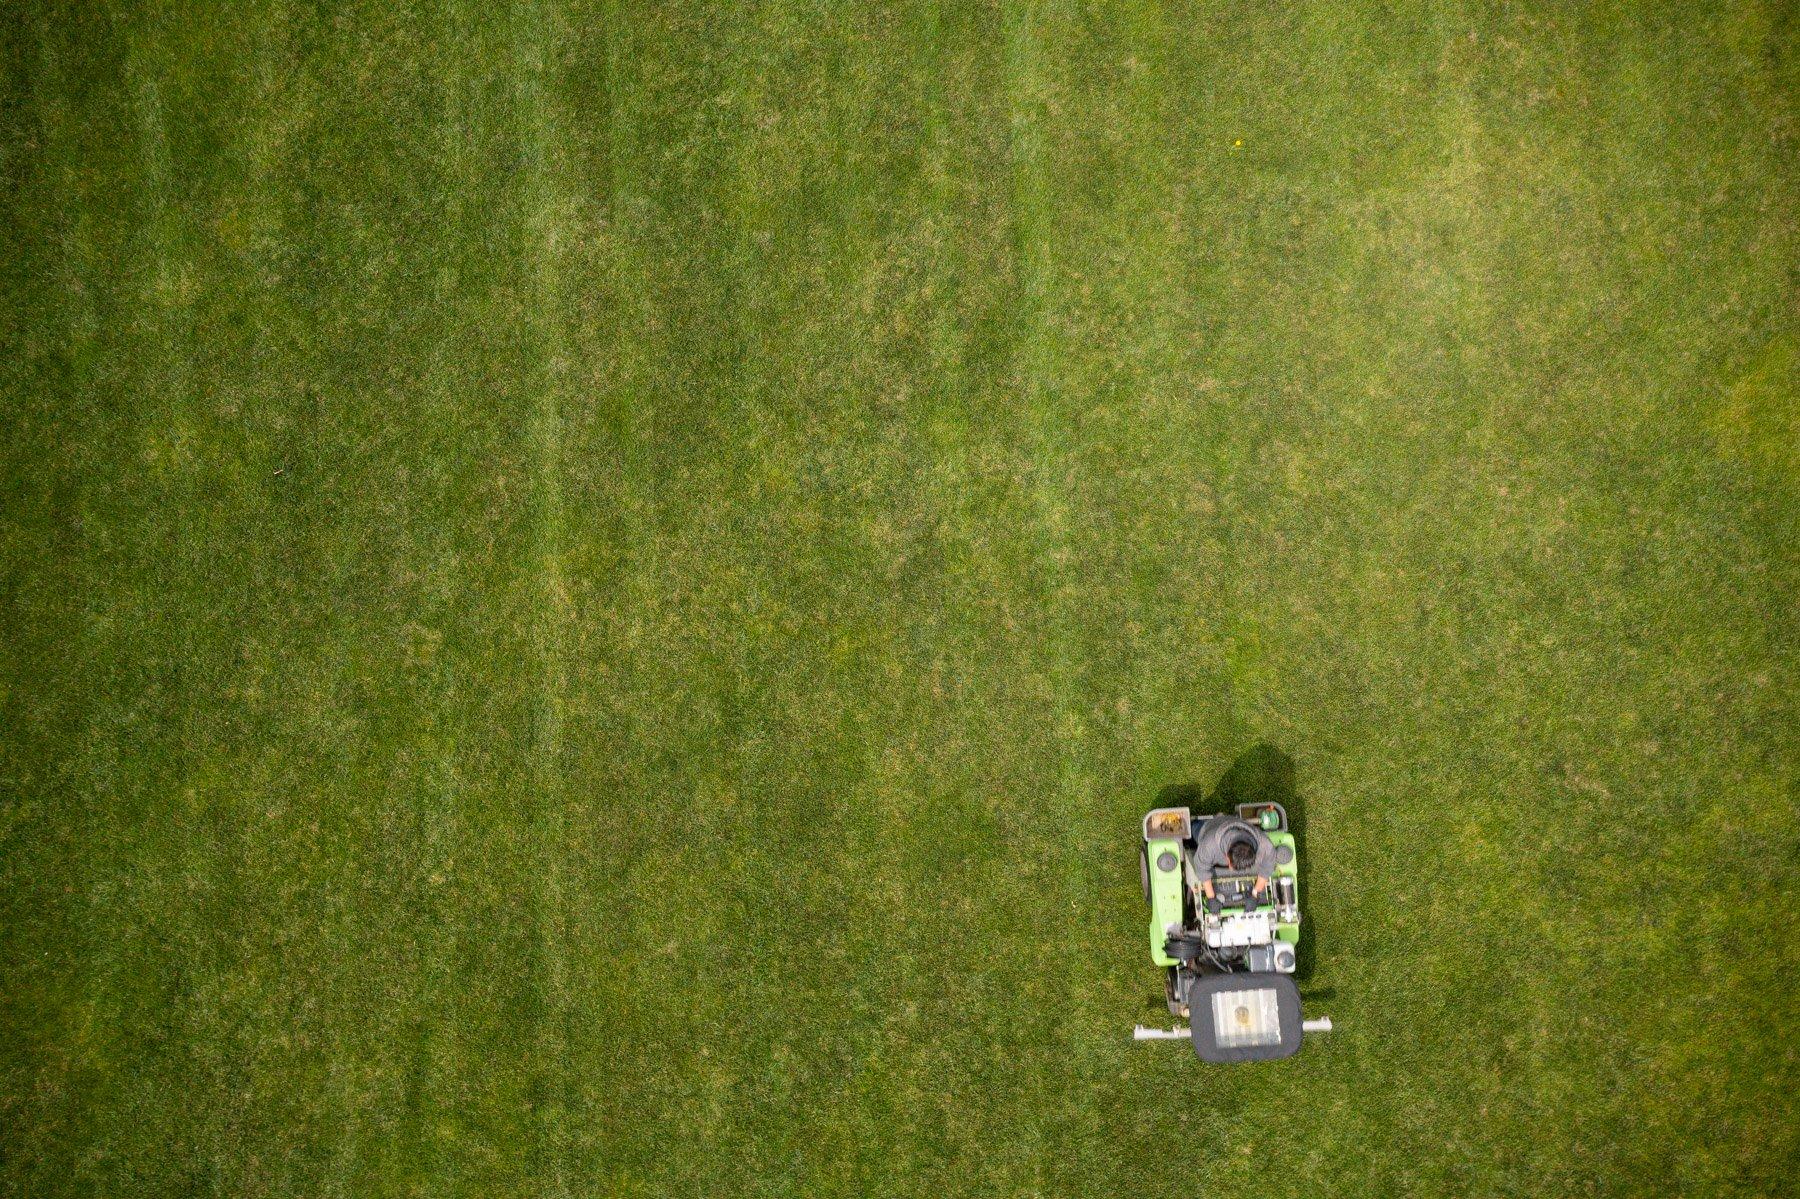 Lawn care technician applying fertilizer